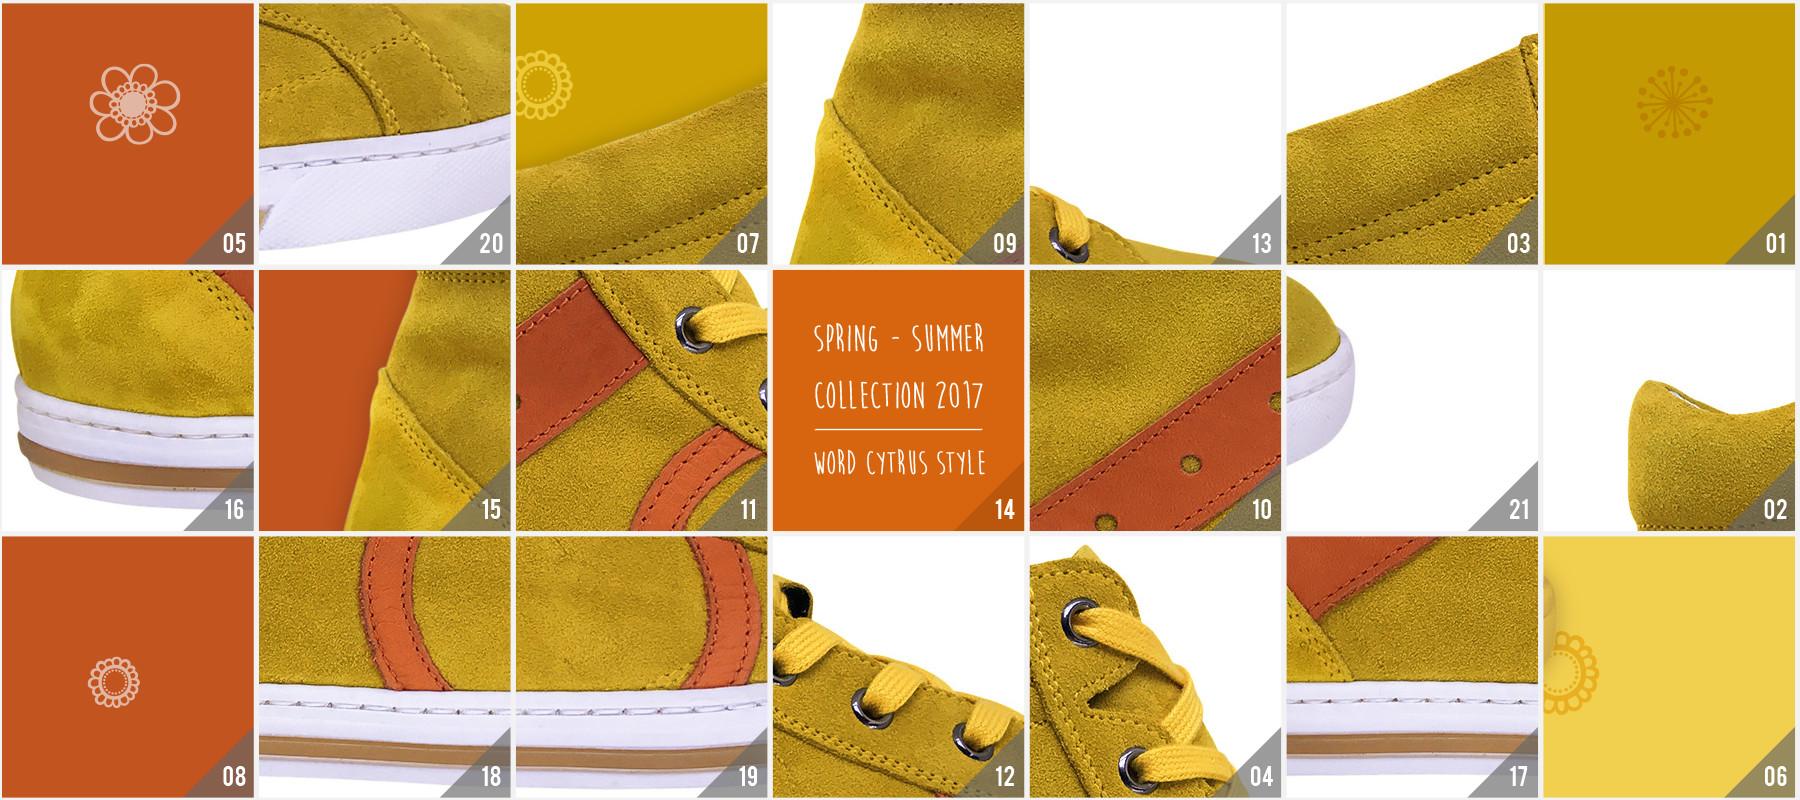 scarpe 100% made in Italy quelle originali